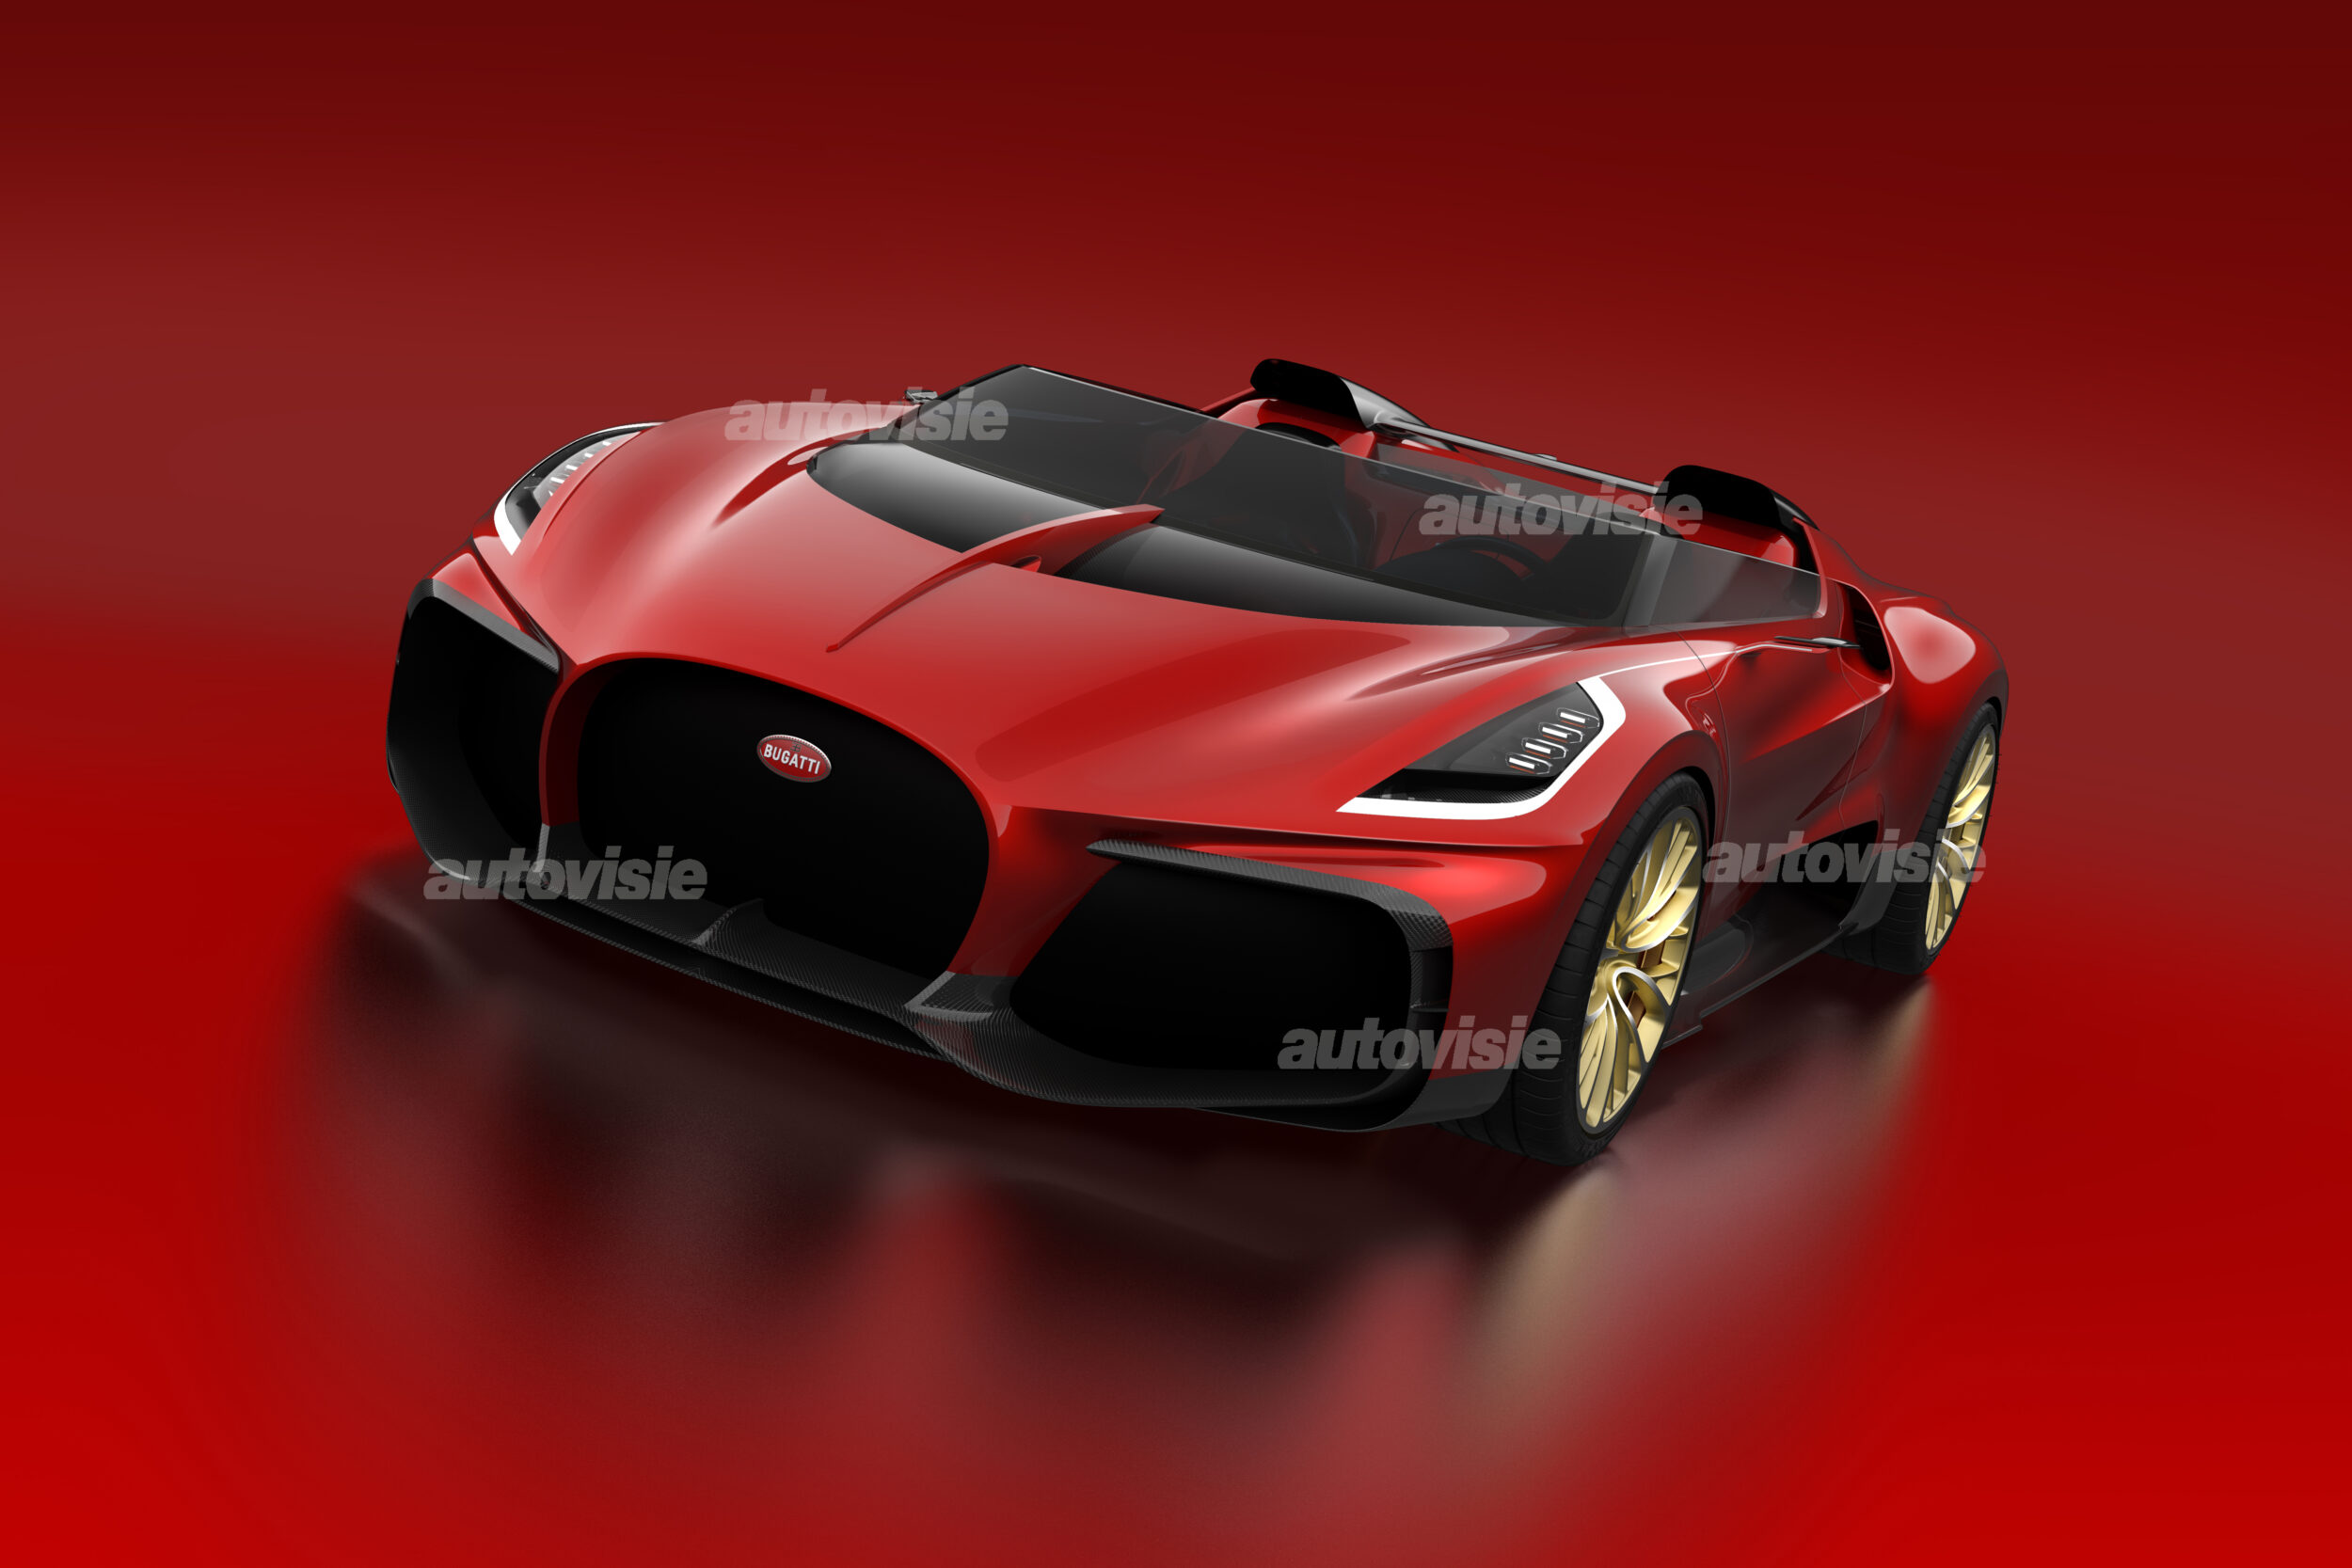 Bugatti Veyron Barchetta Sjoerd van Bilsen